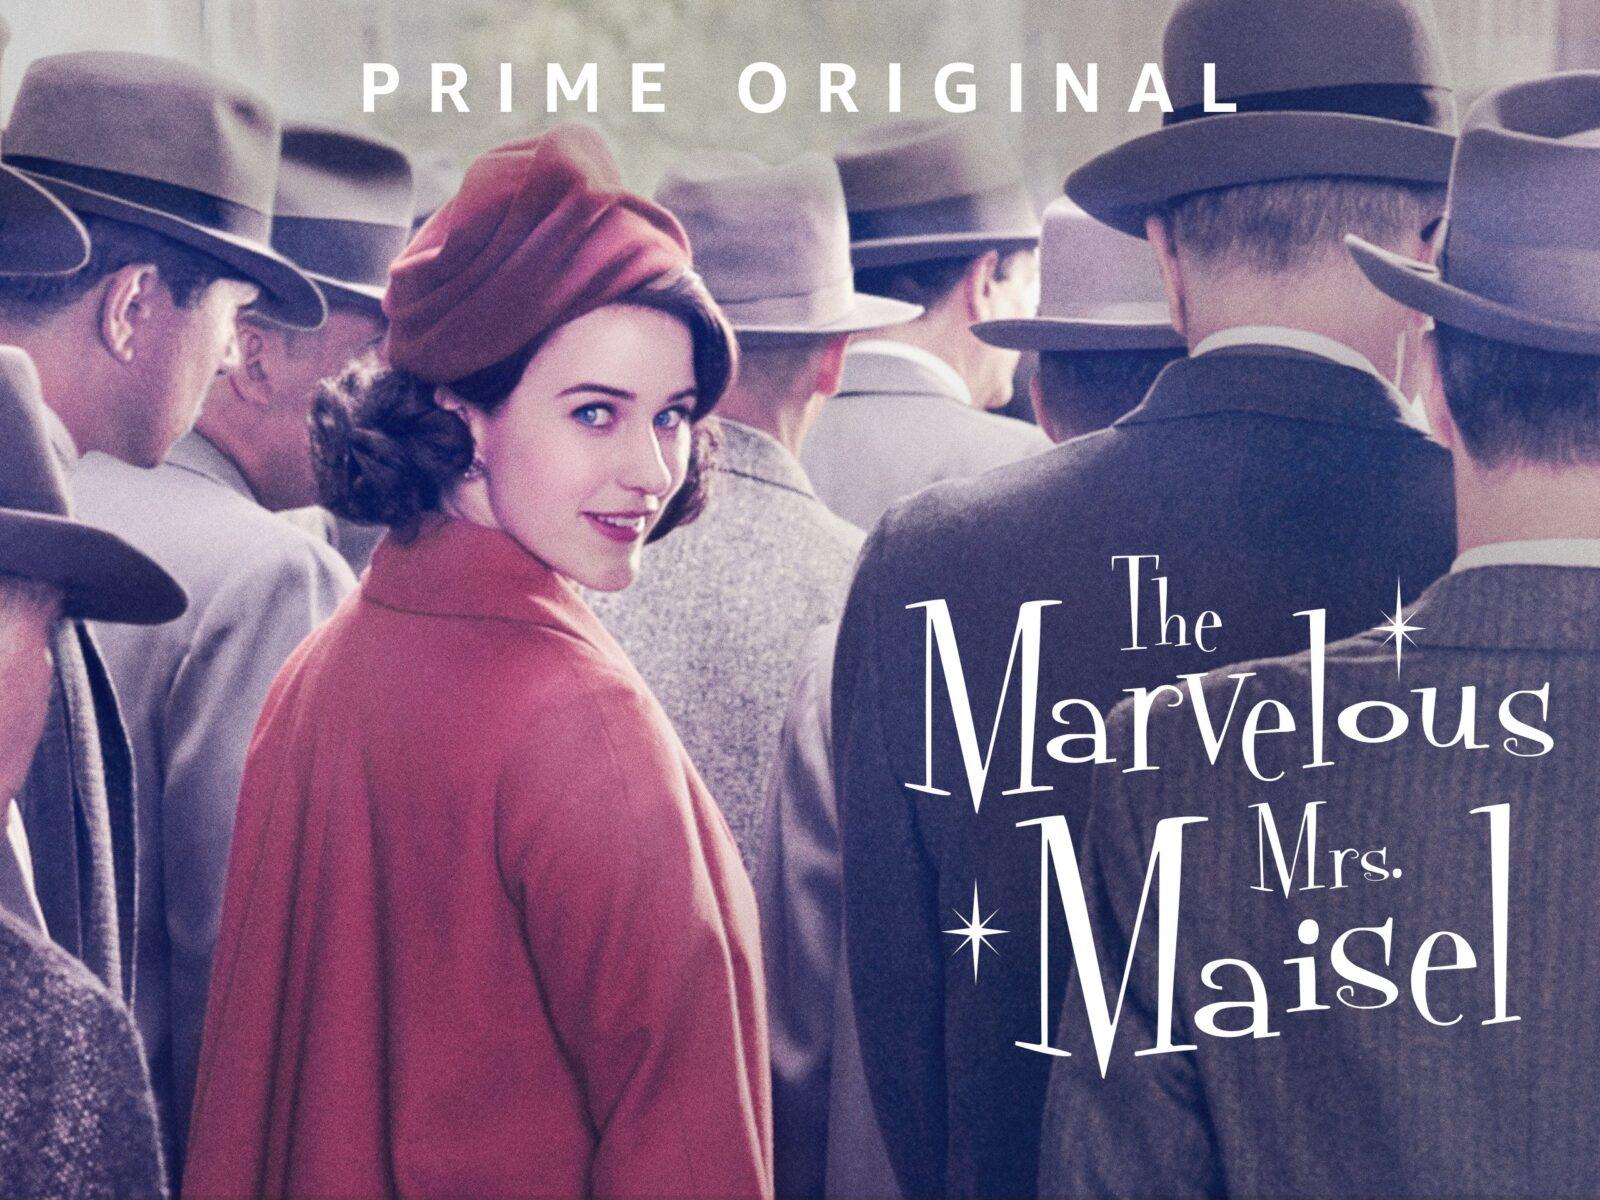 the-marvelous-mrs-maisel-amazon-prime-latest-entertainment-news-india